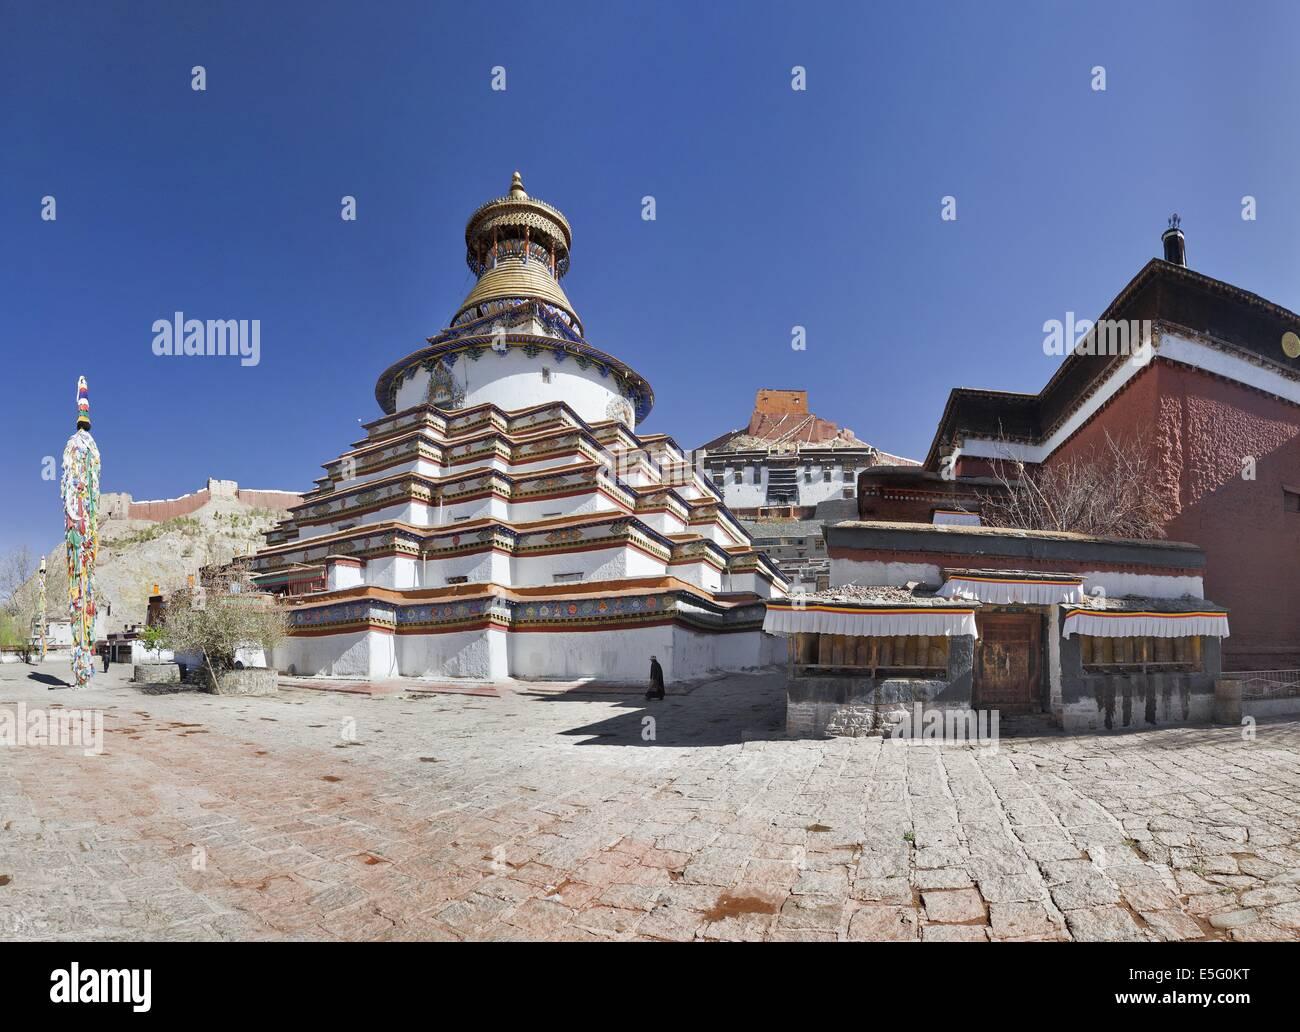 Gyantse Kumbum, a multi-storied aggregate of Buddhist chapels, in Tibet - Stock Image